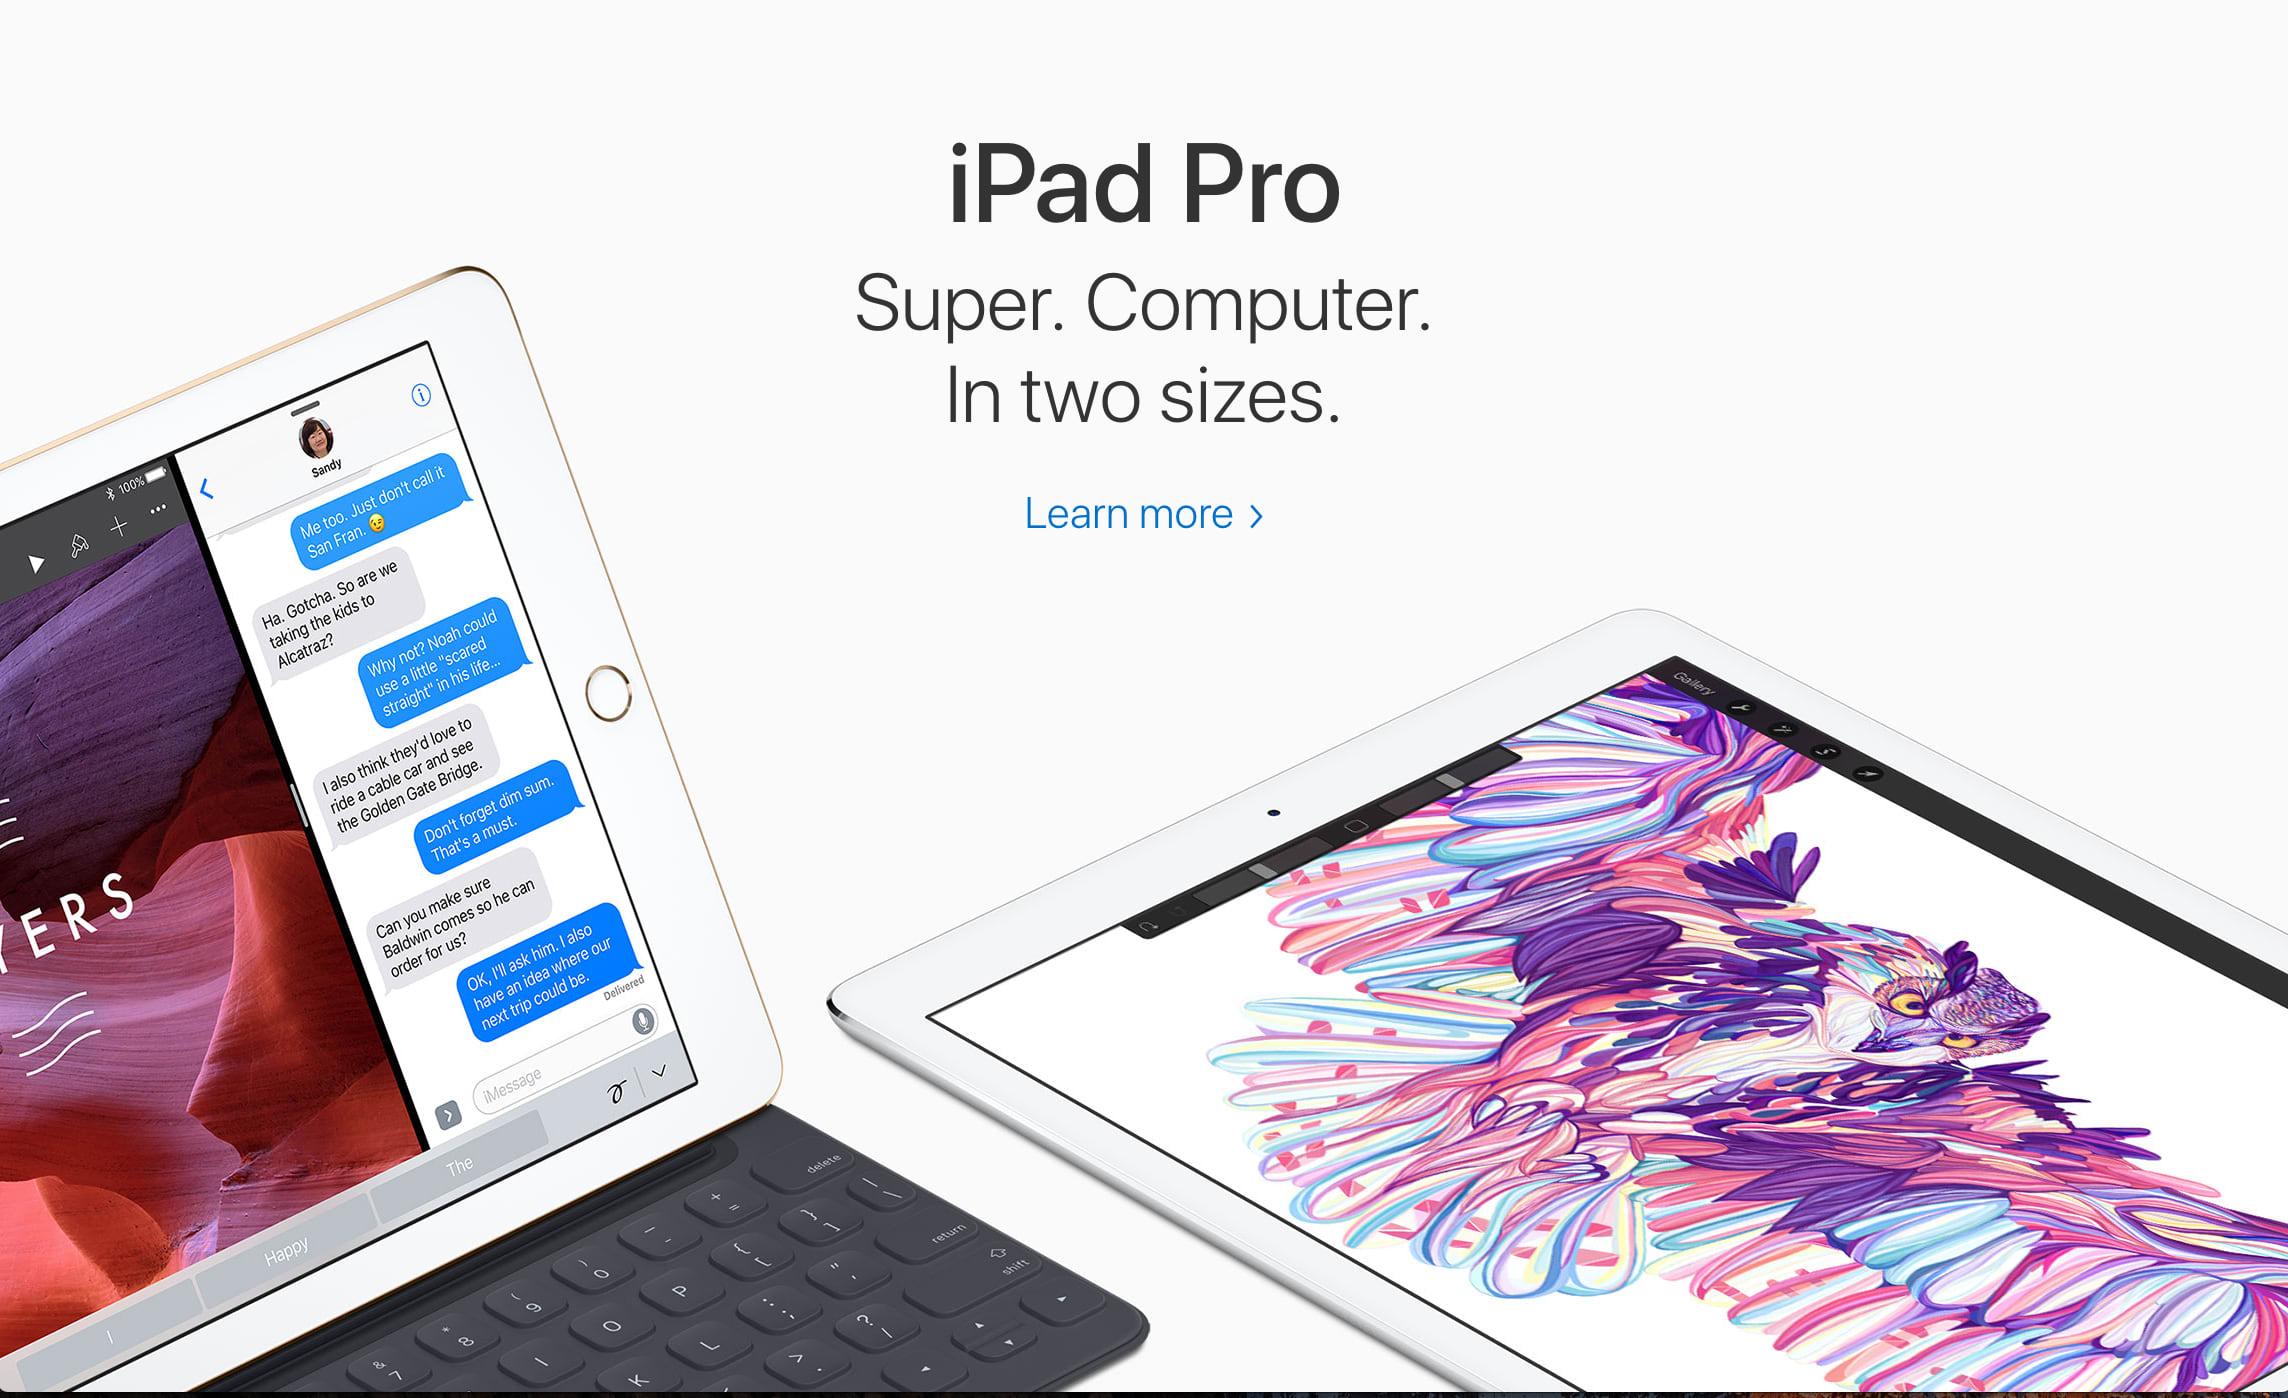 iPad landing page